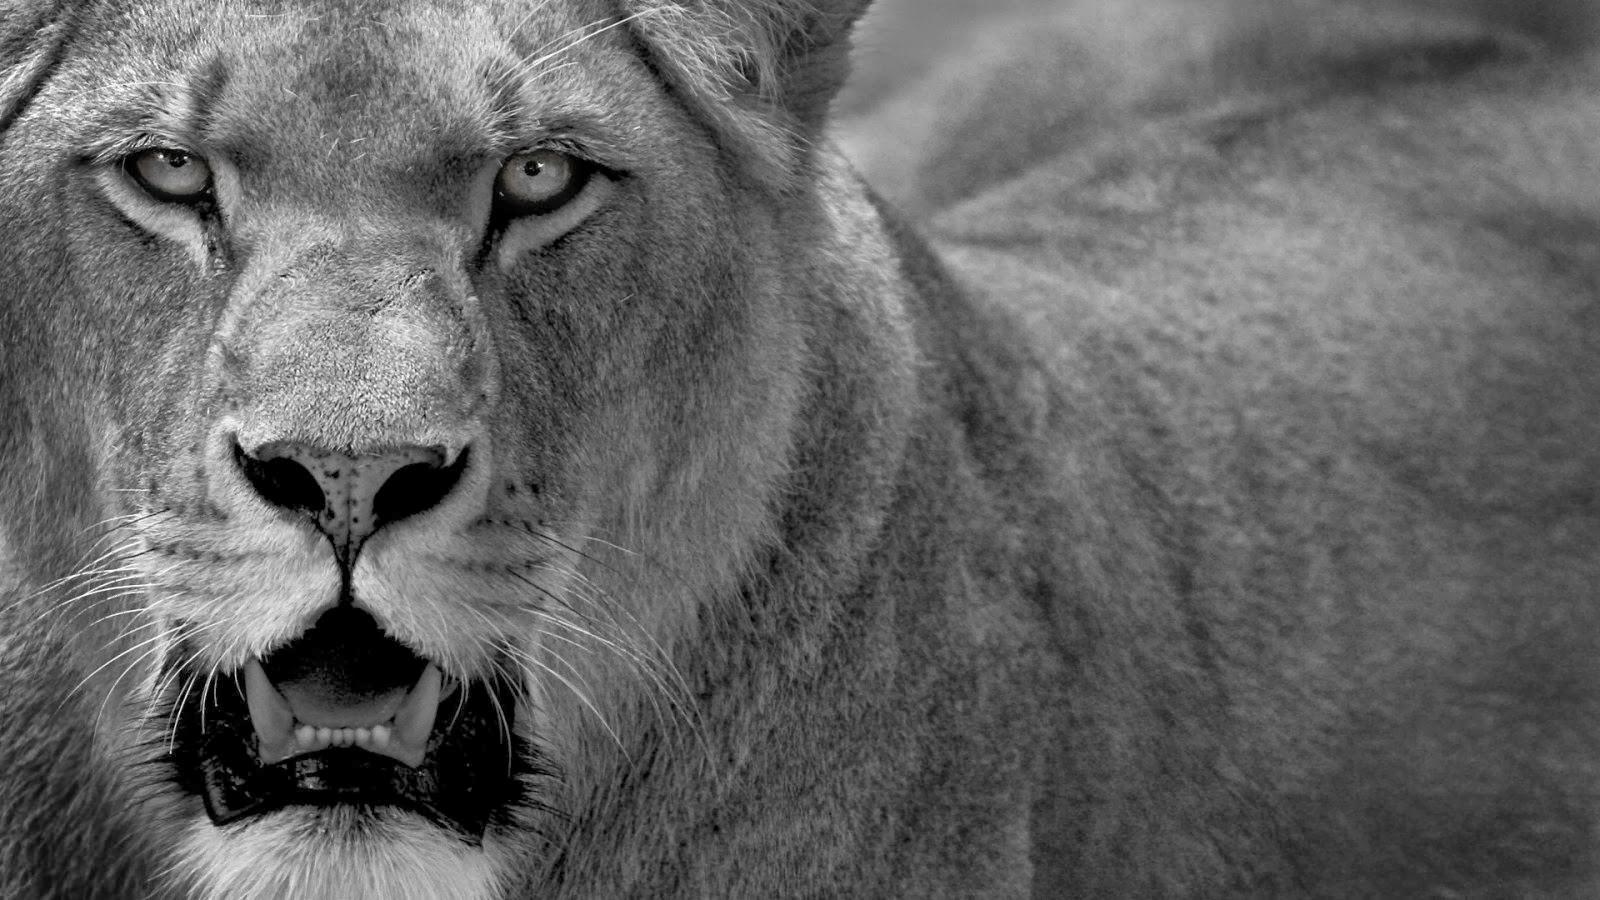 image gallery of black lion wallpaper desktop